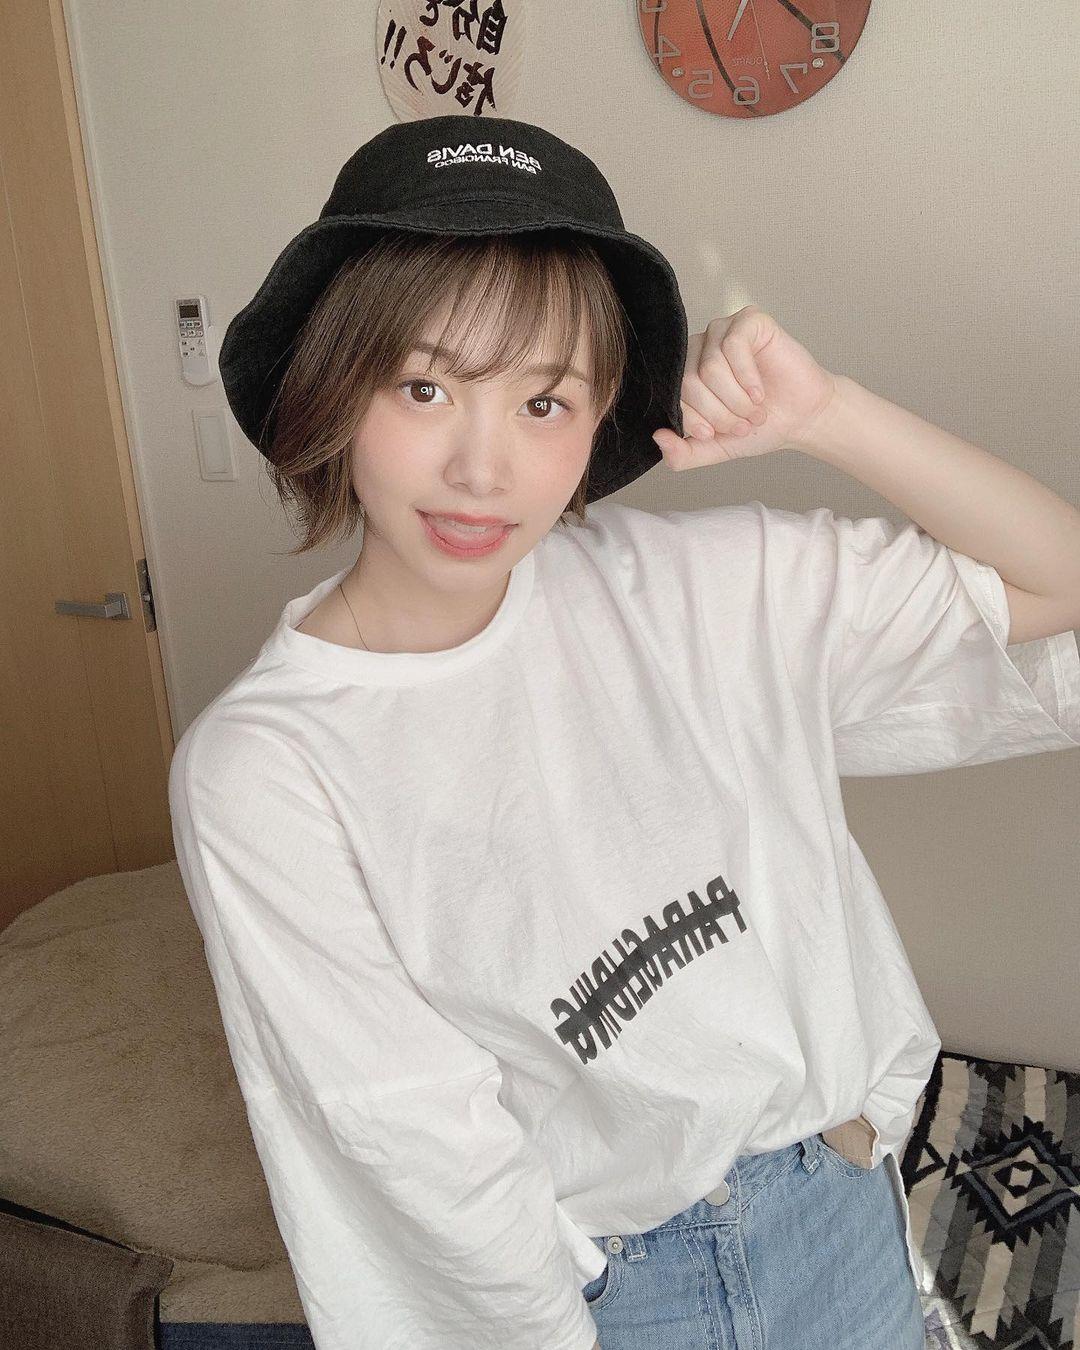 日本最可爱高中生「新田あゆな」长大了!短发童颜造型-新图包